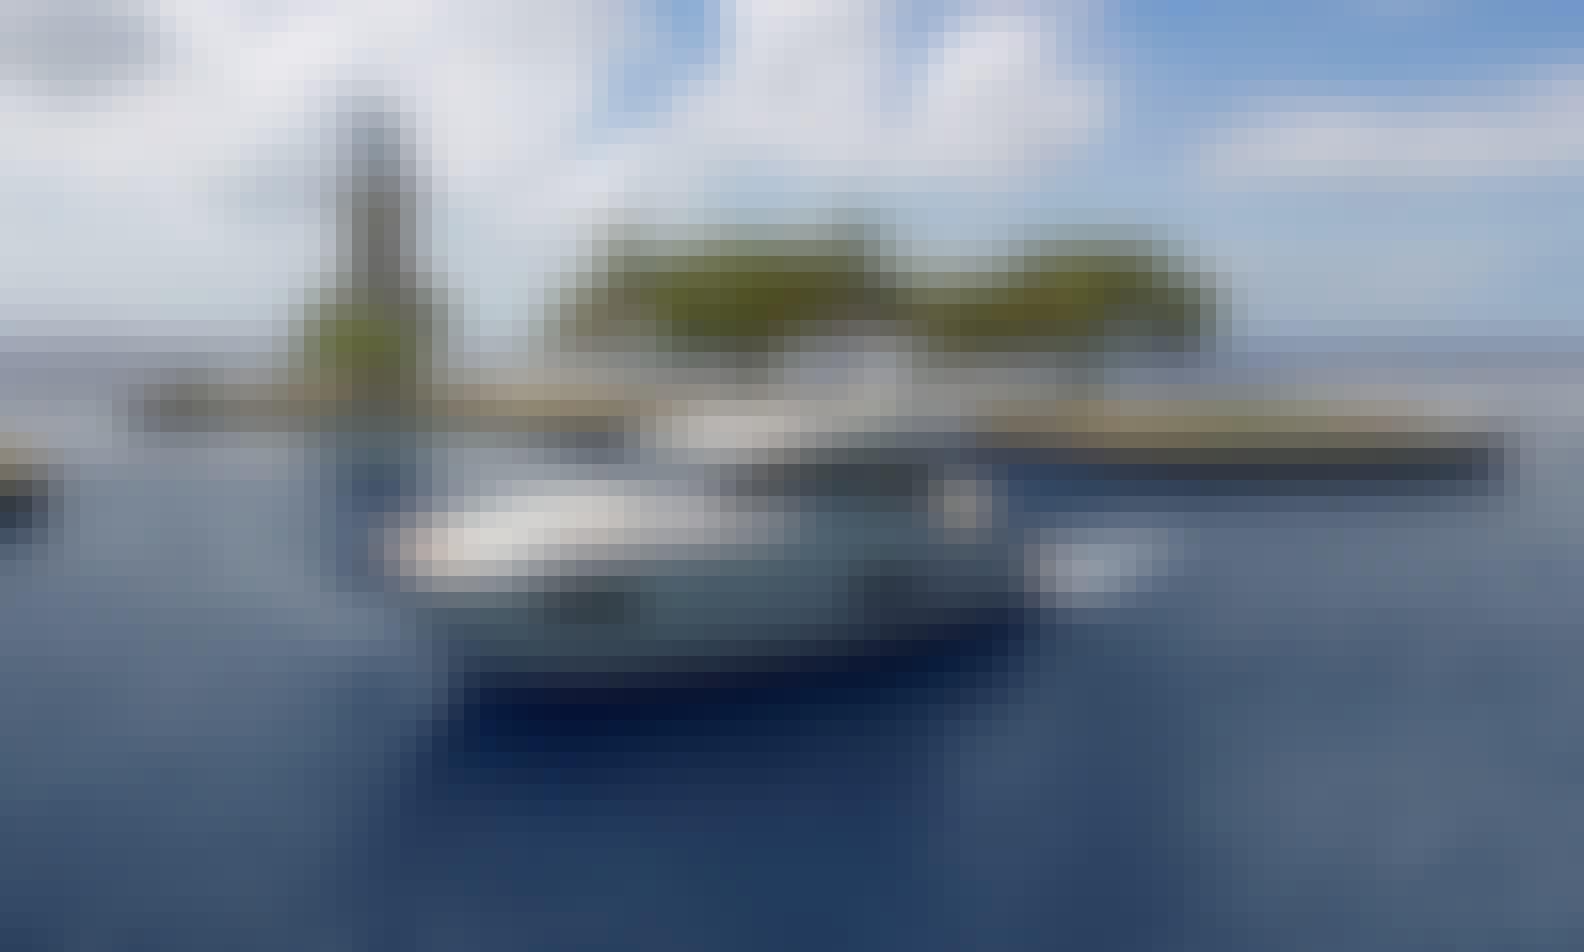 Bavaria 420 Virtess Coupe Luxury Yacht in Marathon, FL Keys